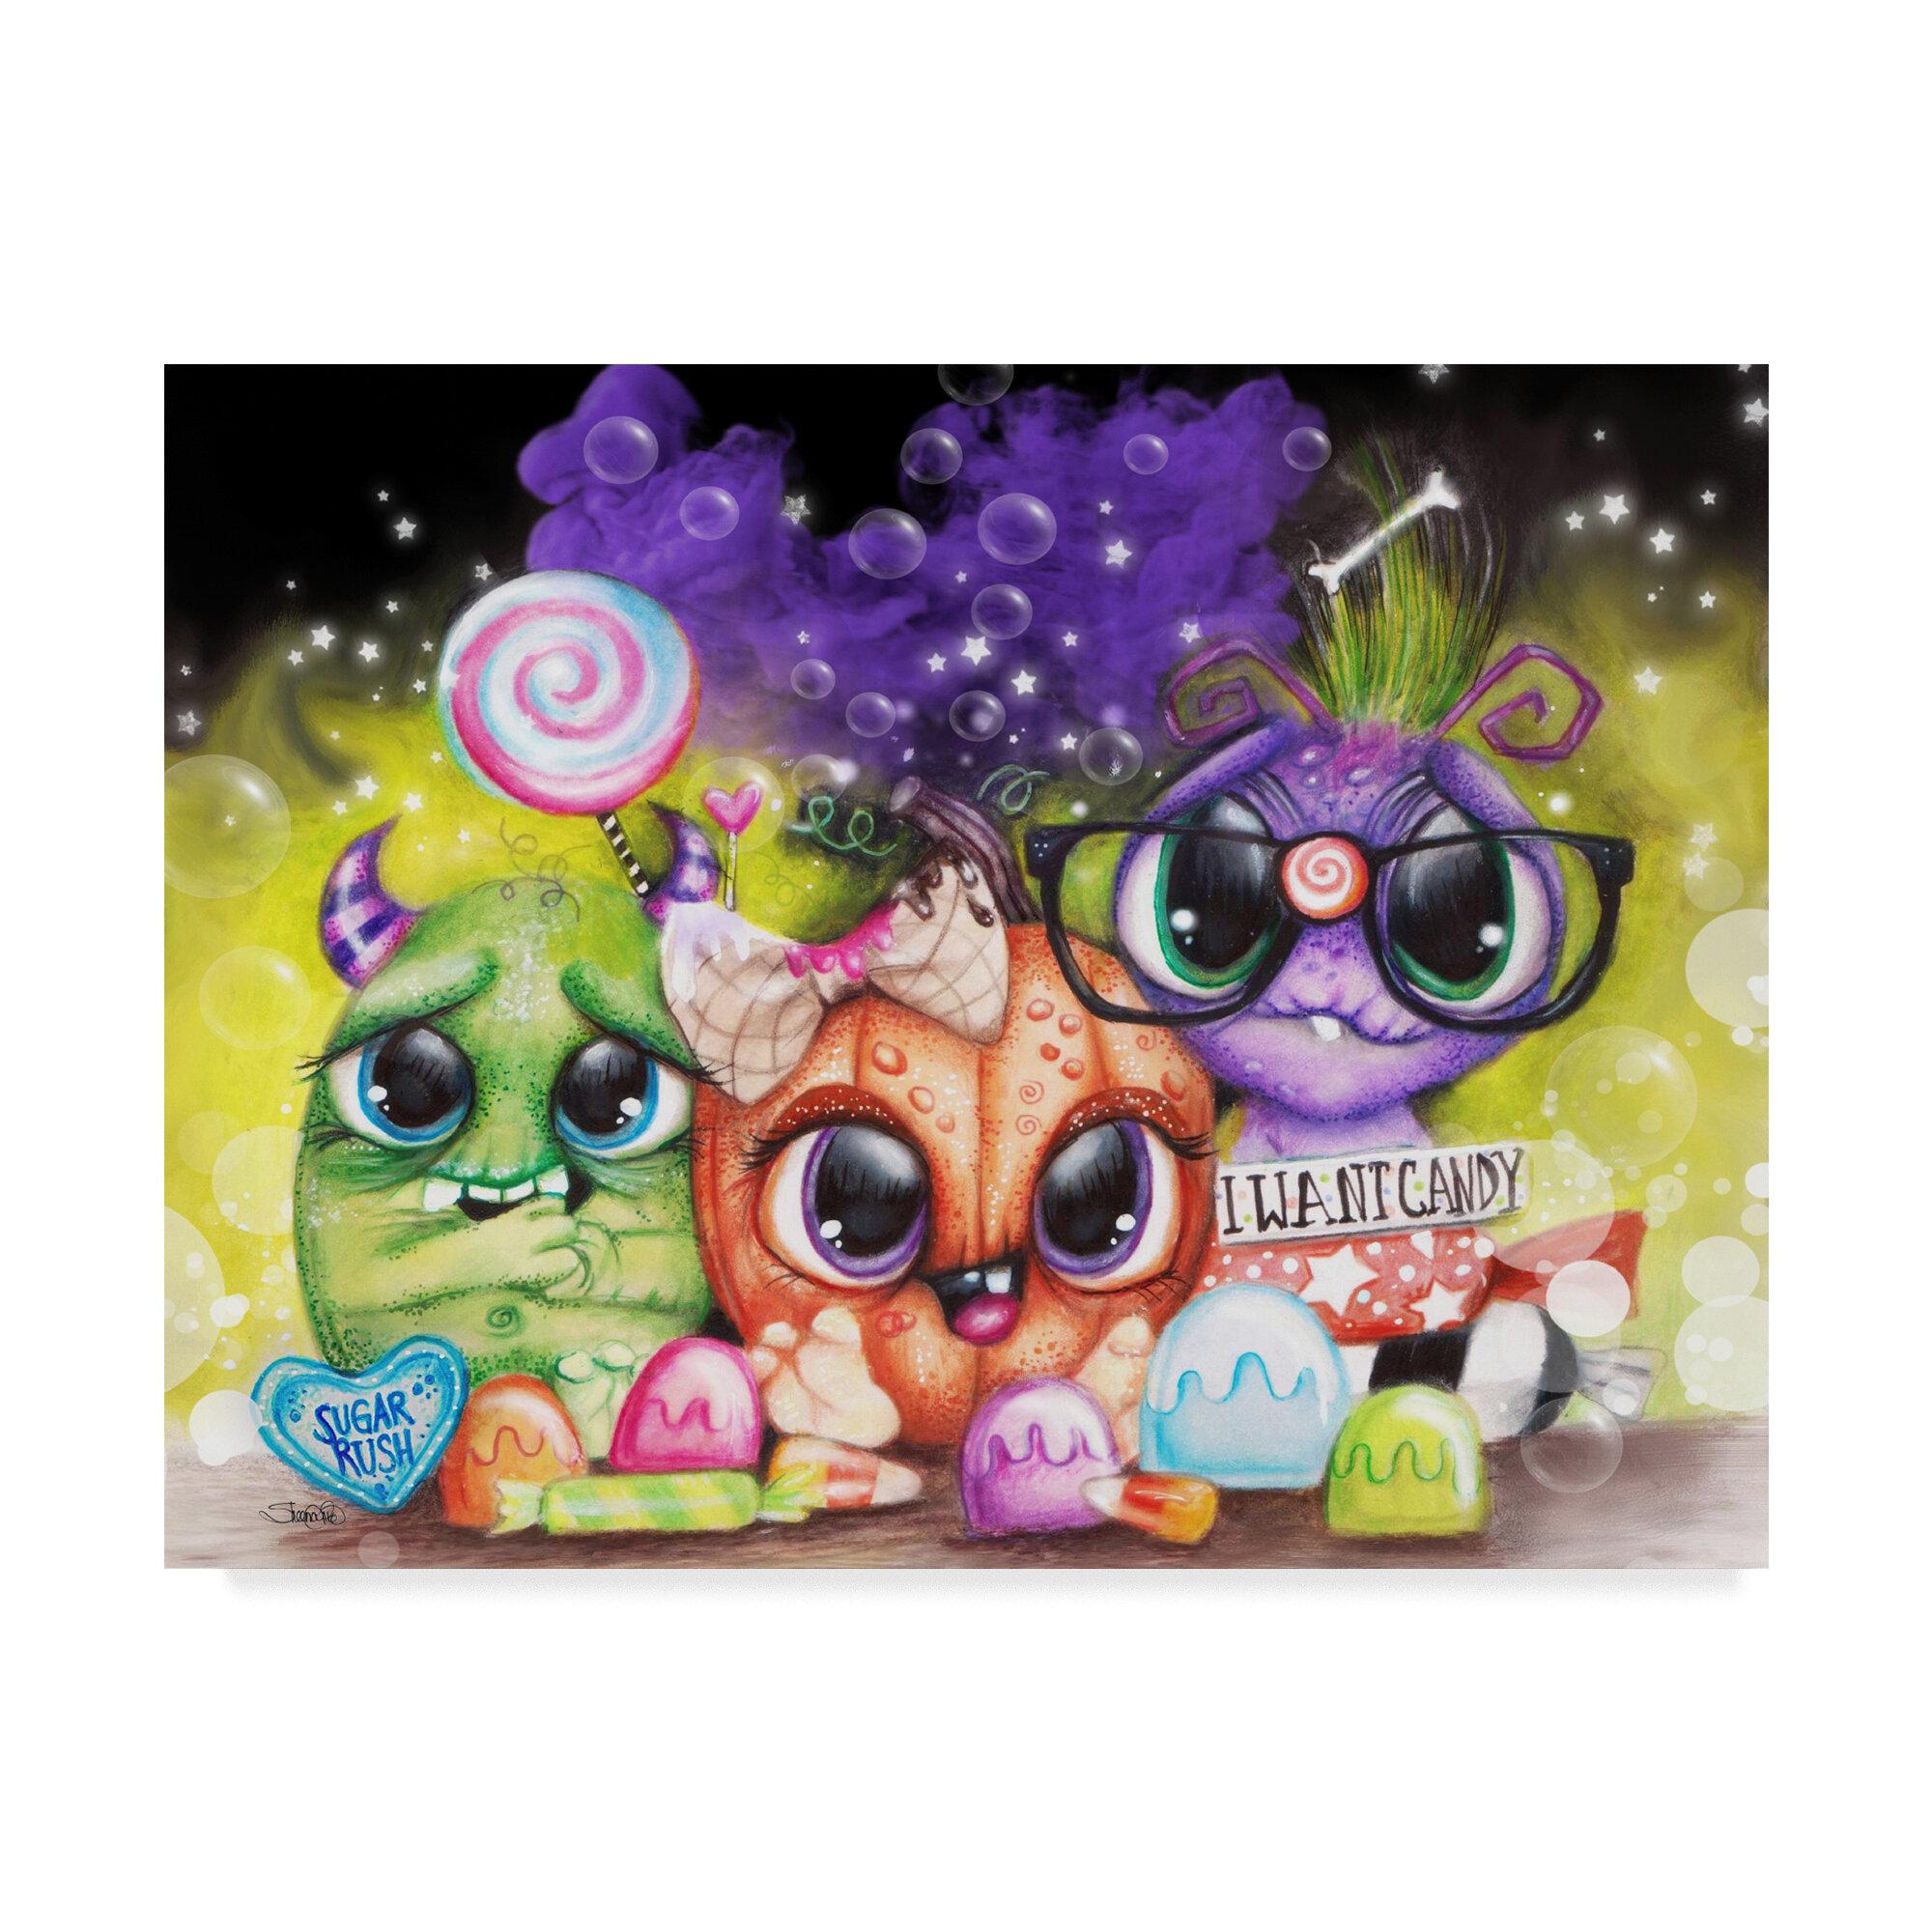 Trademark Art Lil Monsters Halloween Graphic Art Print On Wrapped Canvas Wayfair